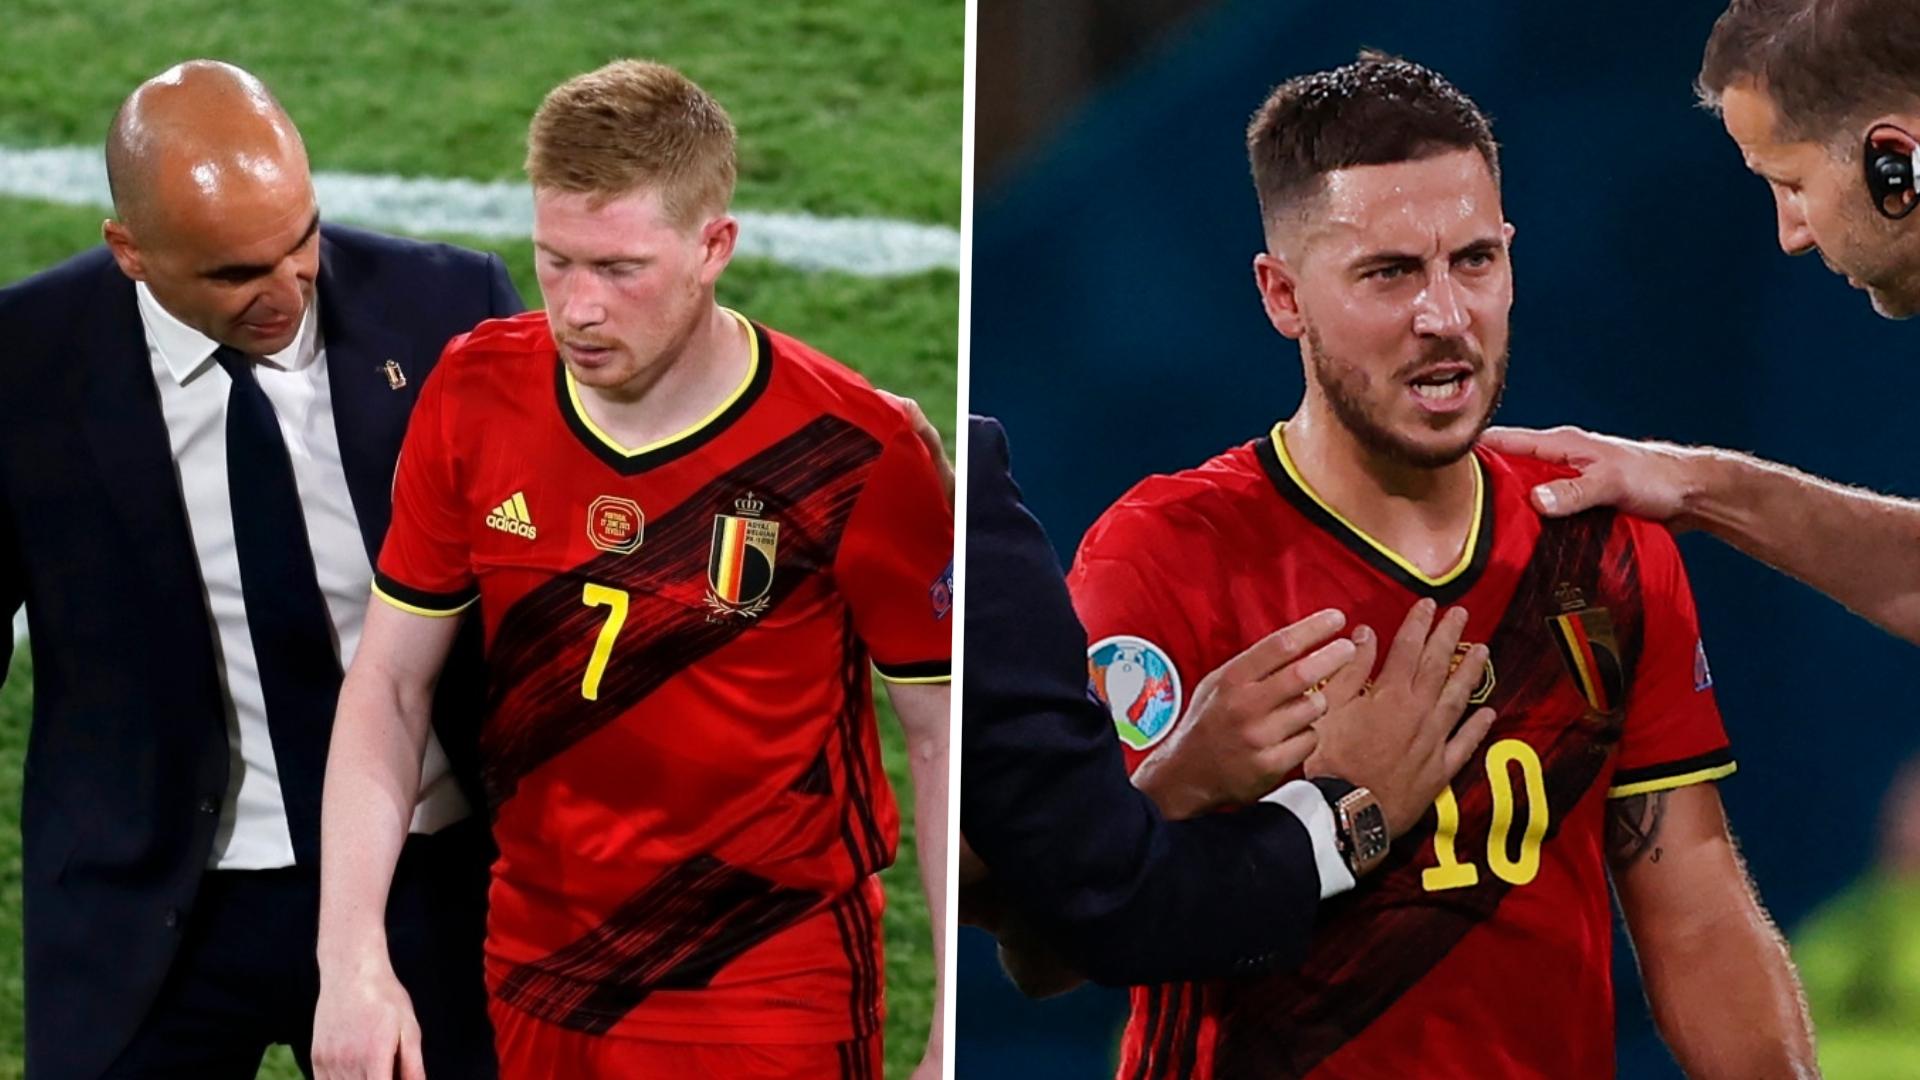 Will Belgium stars Kevin De Bruyne & Eden Hazard be fit to play vs Italy?